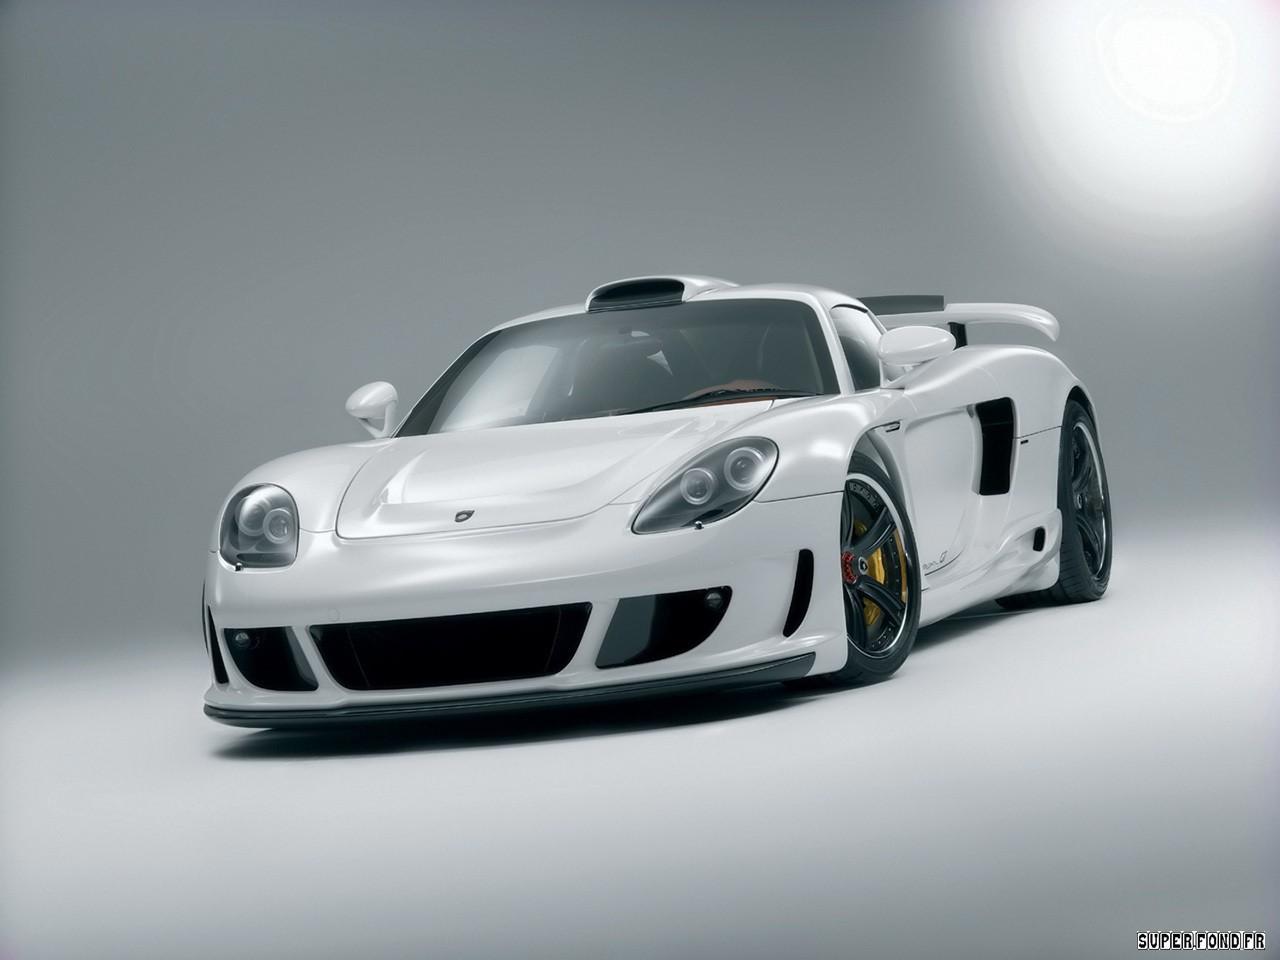 2007 Gemballa - Porsche Carrera Mirage GT